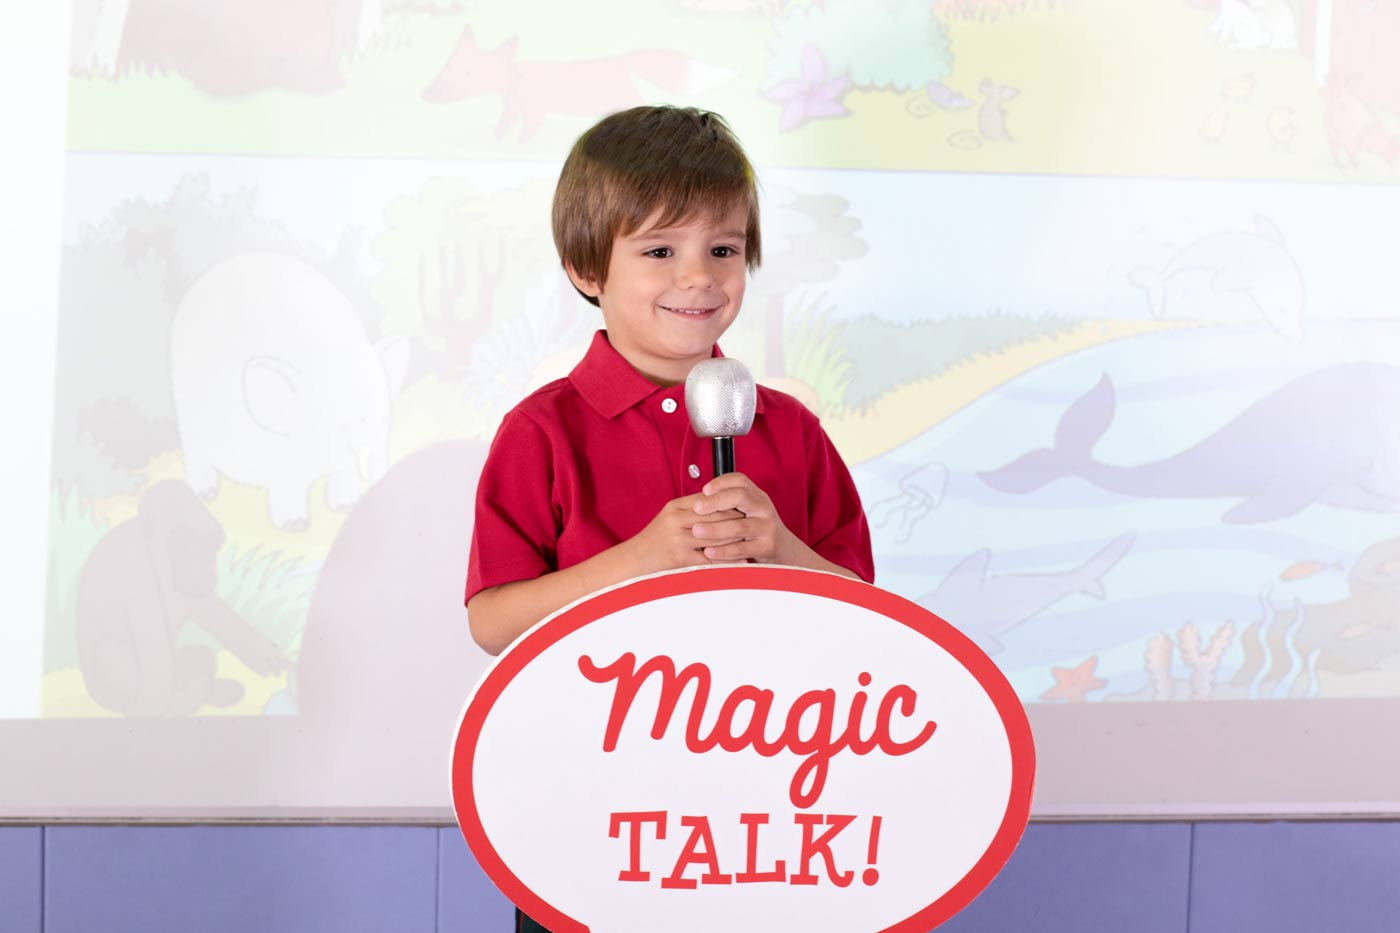 MAGIC-TALK-2.CR2-Editar-1